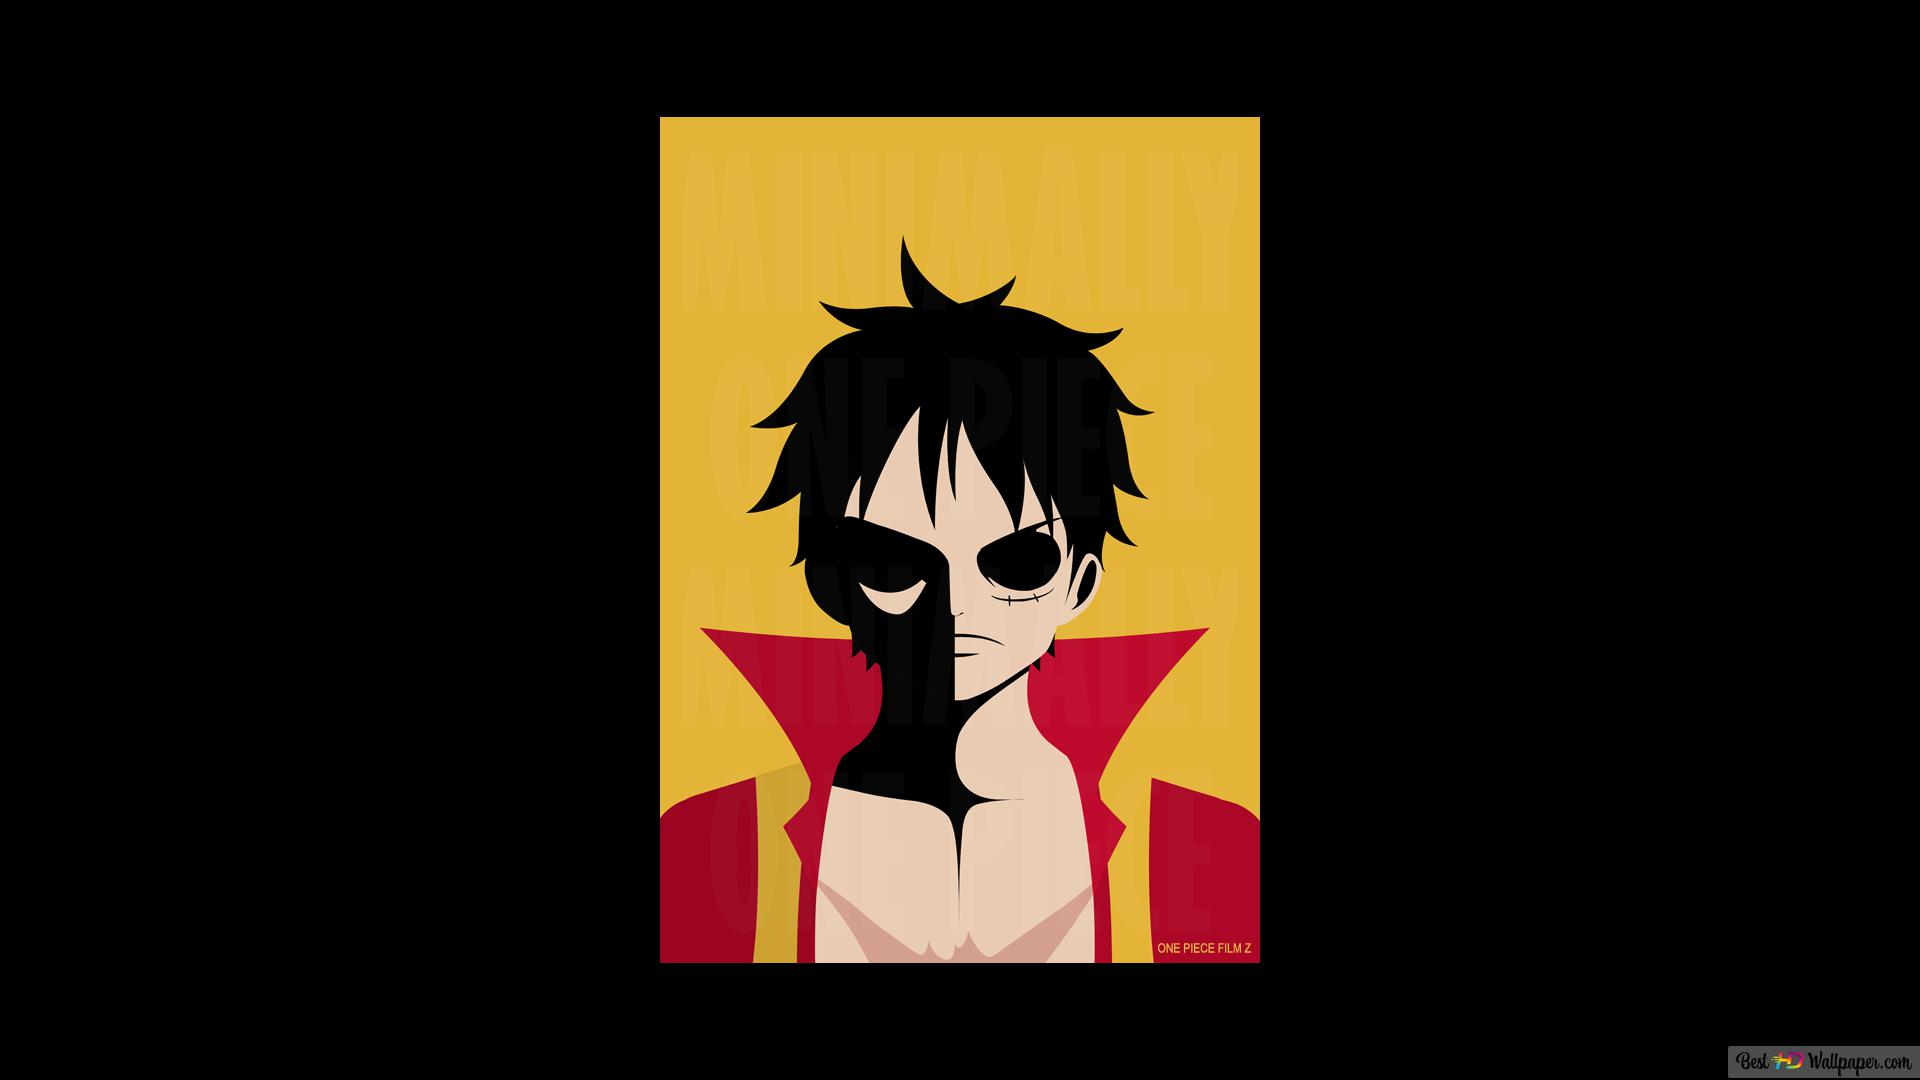 One Piece Monkey D Luffy Minimalist Hd Wallpaper Download